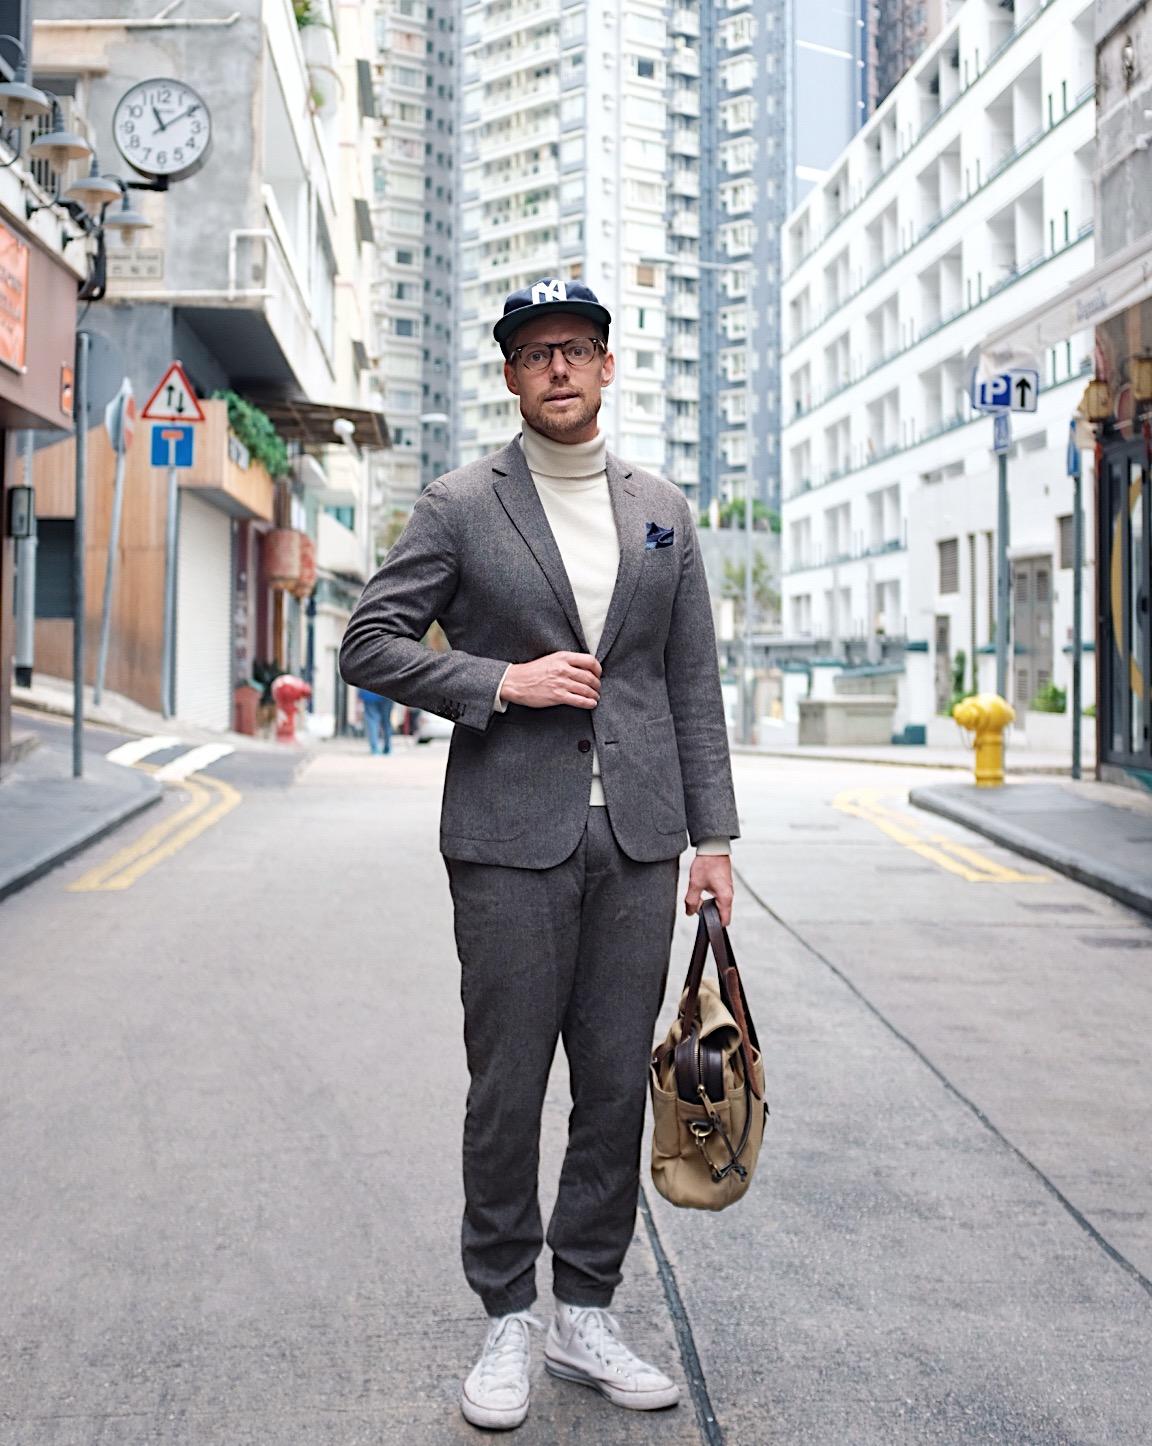 casual_VBC Wool Silk_Jogger Suit_1.JPG